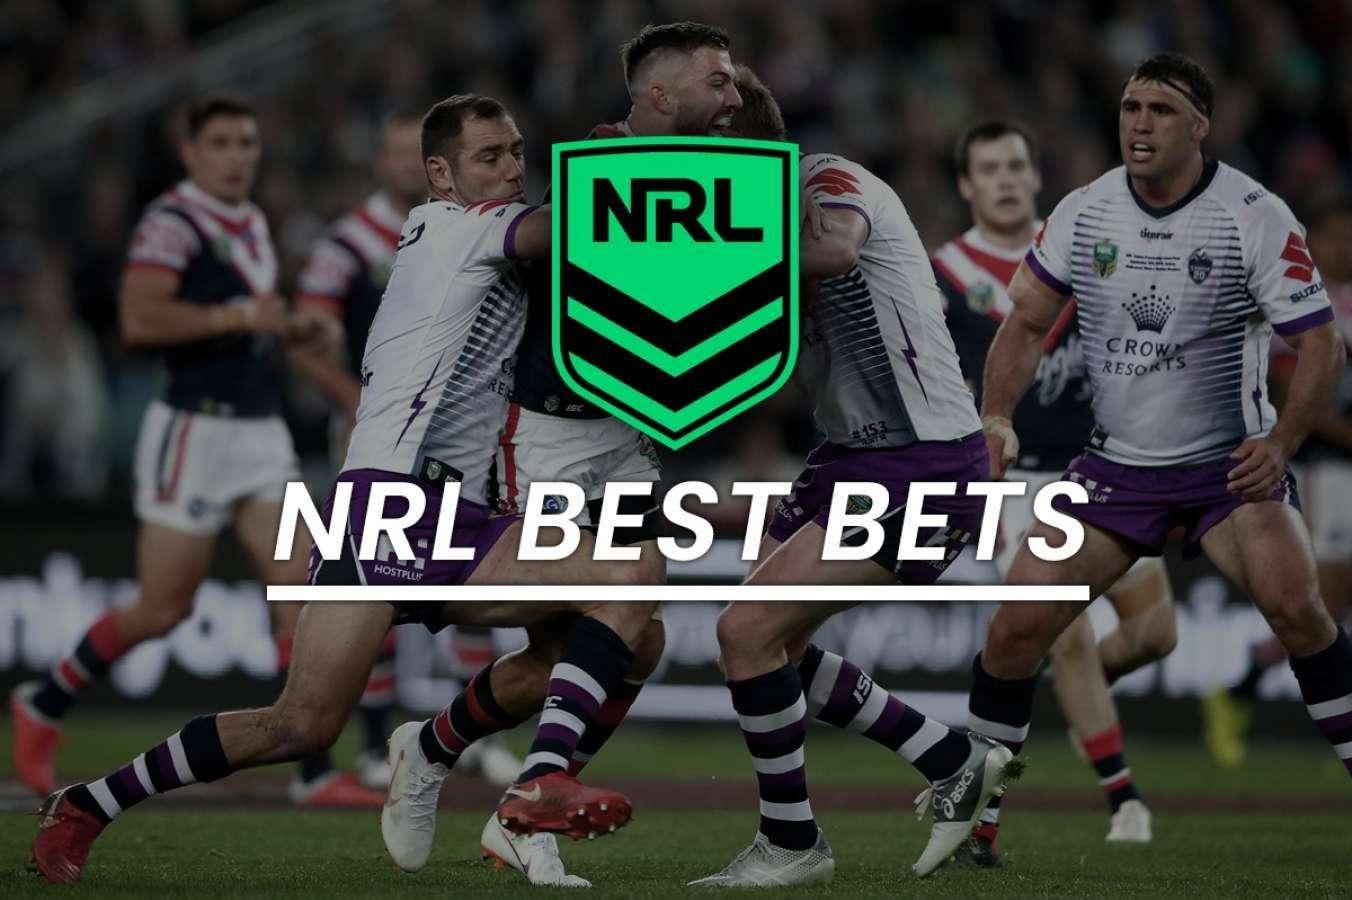 nrl round 6 2021 betting line